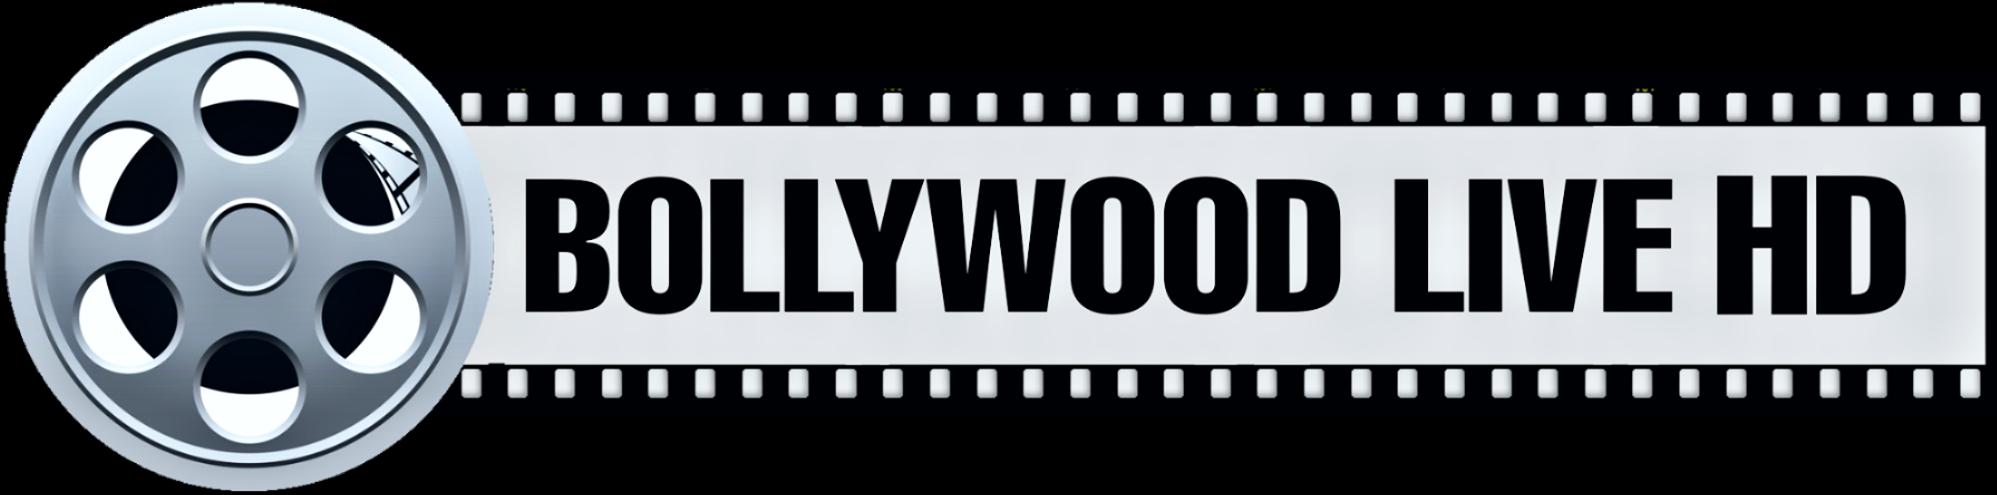 BollywoodliveHD